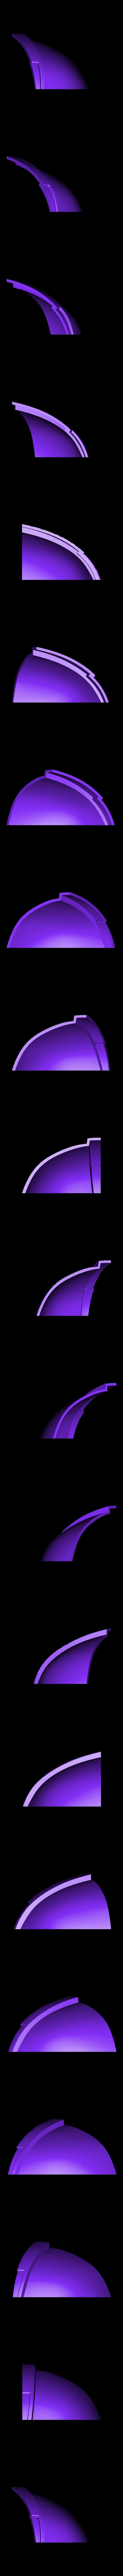 Part_11_v4.stl Download free STL file  Blood Dragon Helmet Mass Effect 2 (With Back Access) • 3D printable template, VillainousPropShop